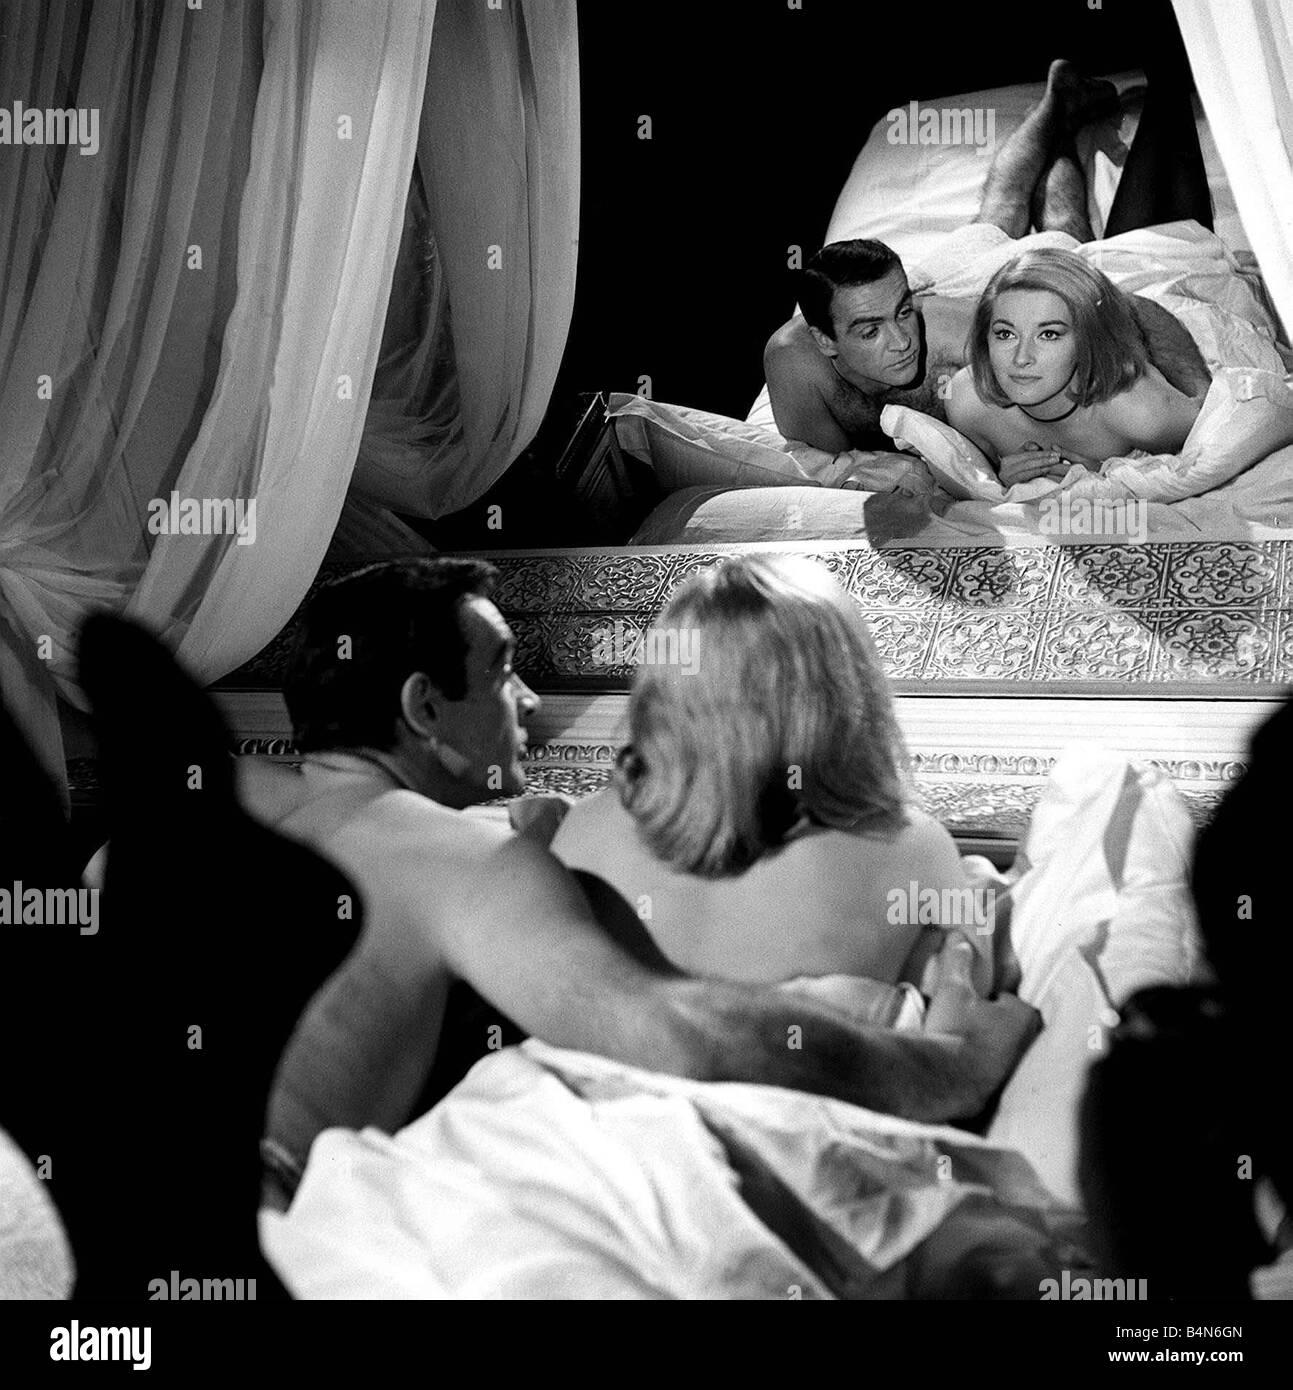 Sean Sex Scene 29